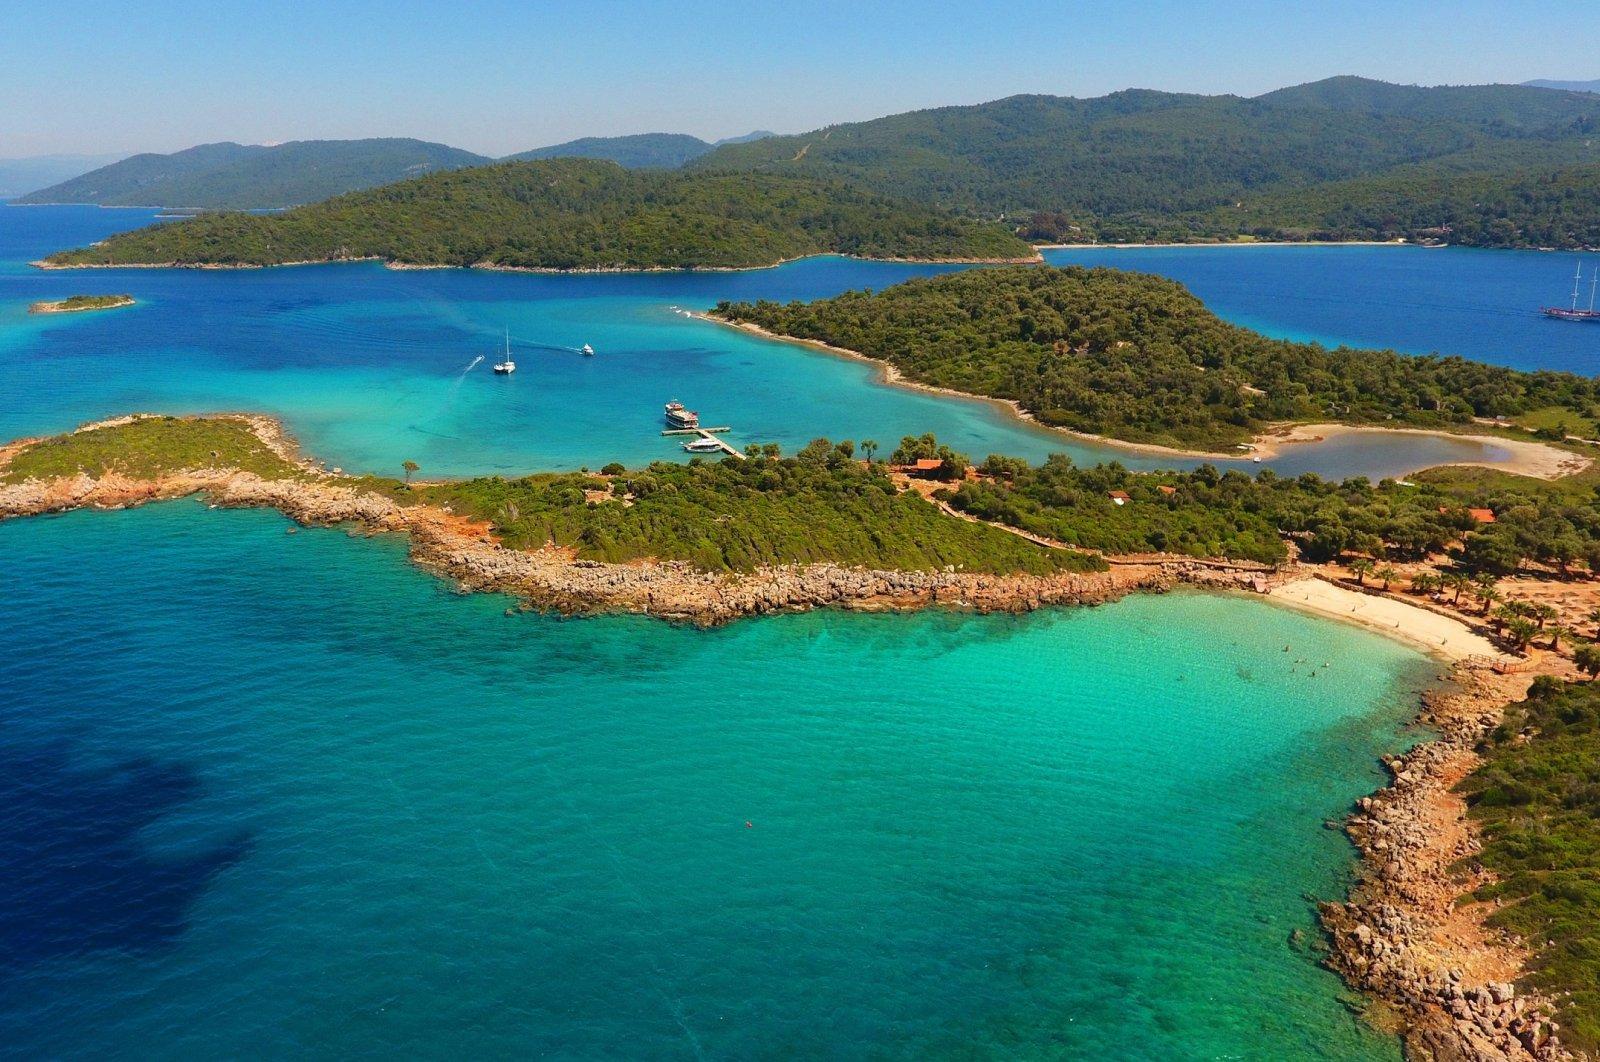 Blue and aqua seawater surrounds Sedir Island – also known as Cleopatra Island– in Gökova, Marmaris, Muğla province, southwestern Turkey. (Shutterstock Photo)